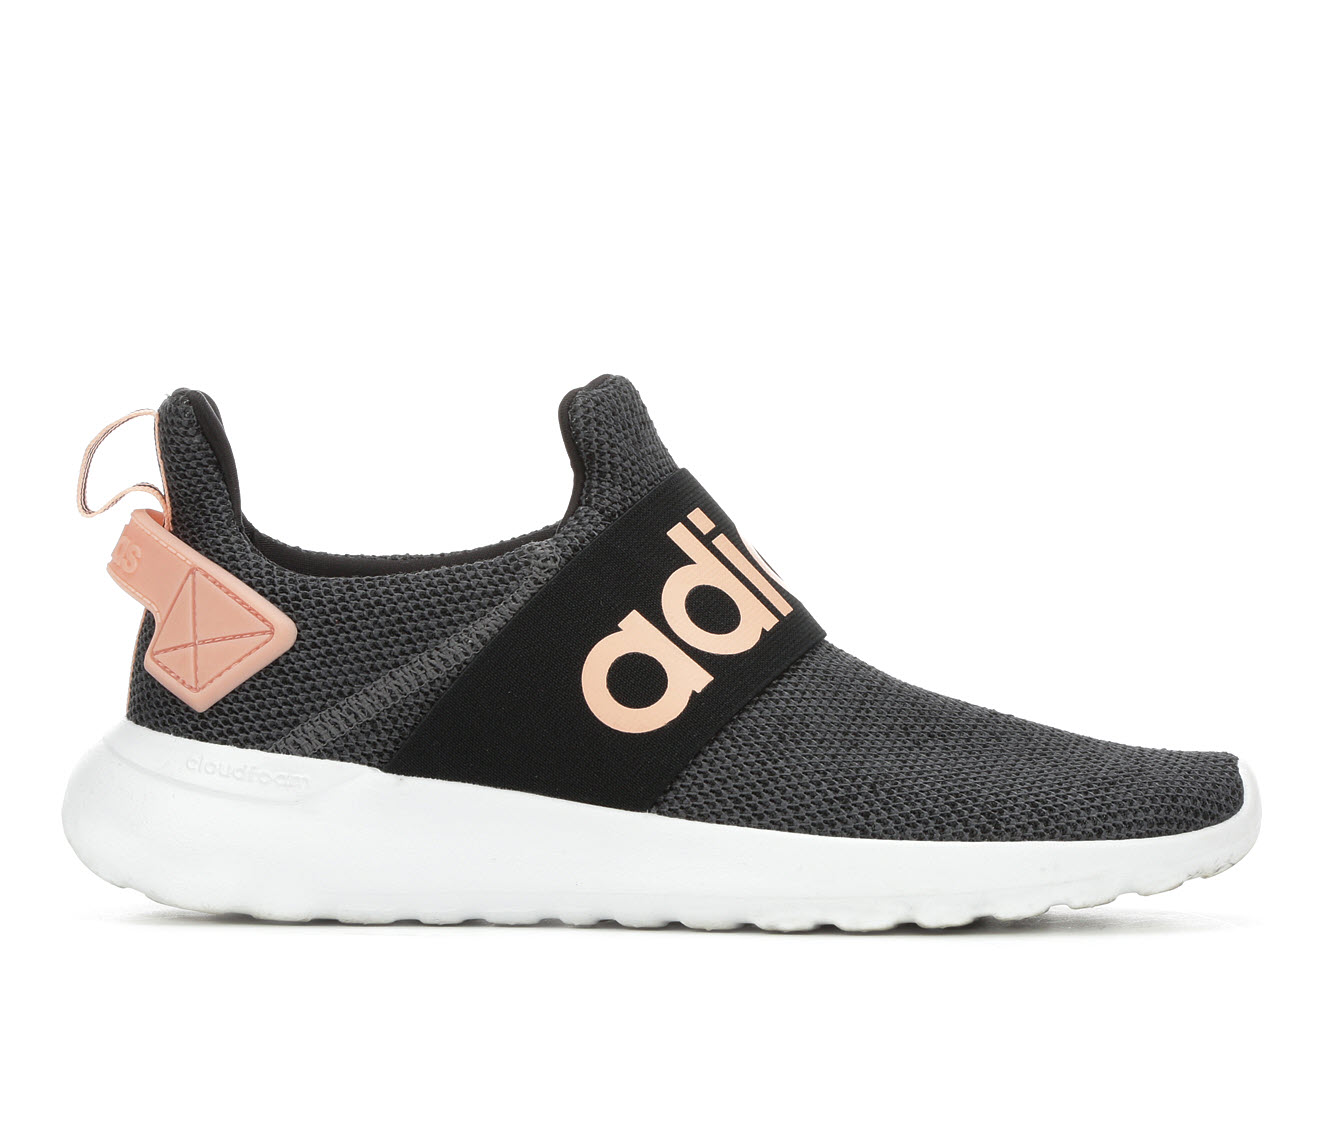 Adidas Lite Racer Adapt Women's Athletic Shoe (Gray)